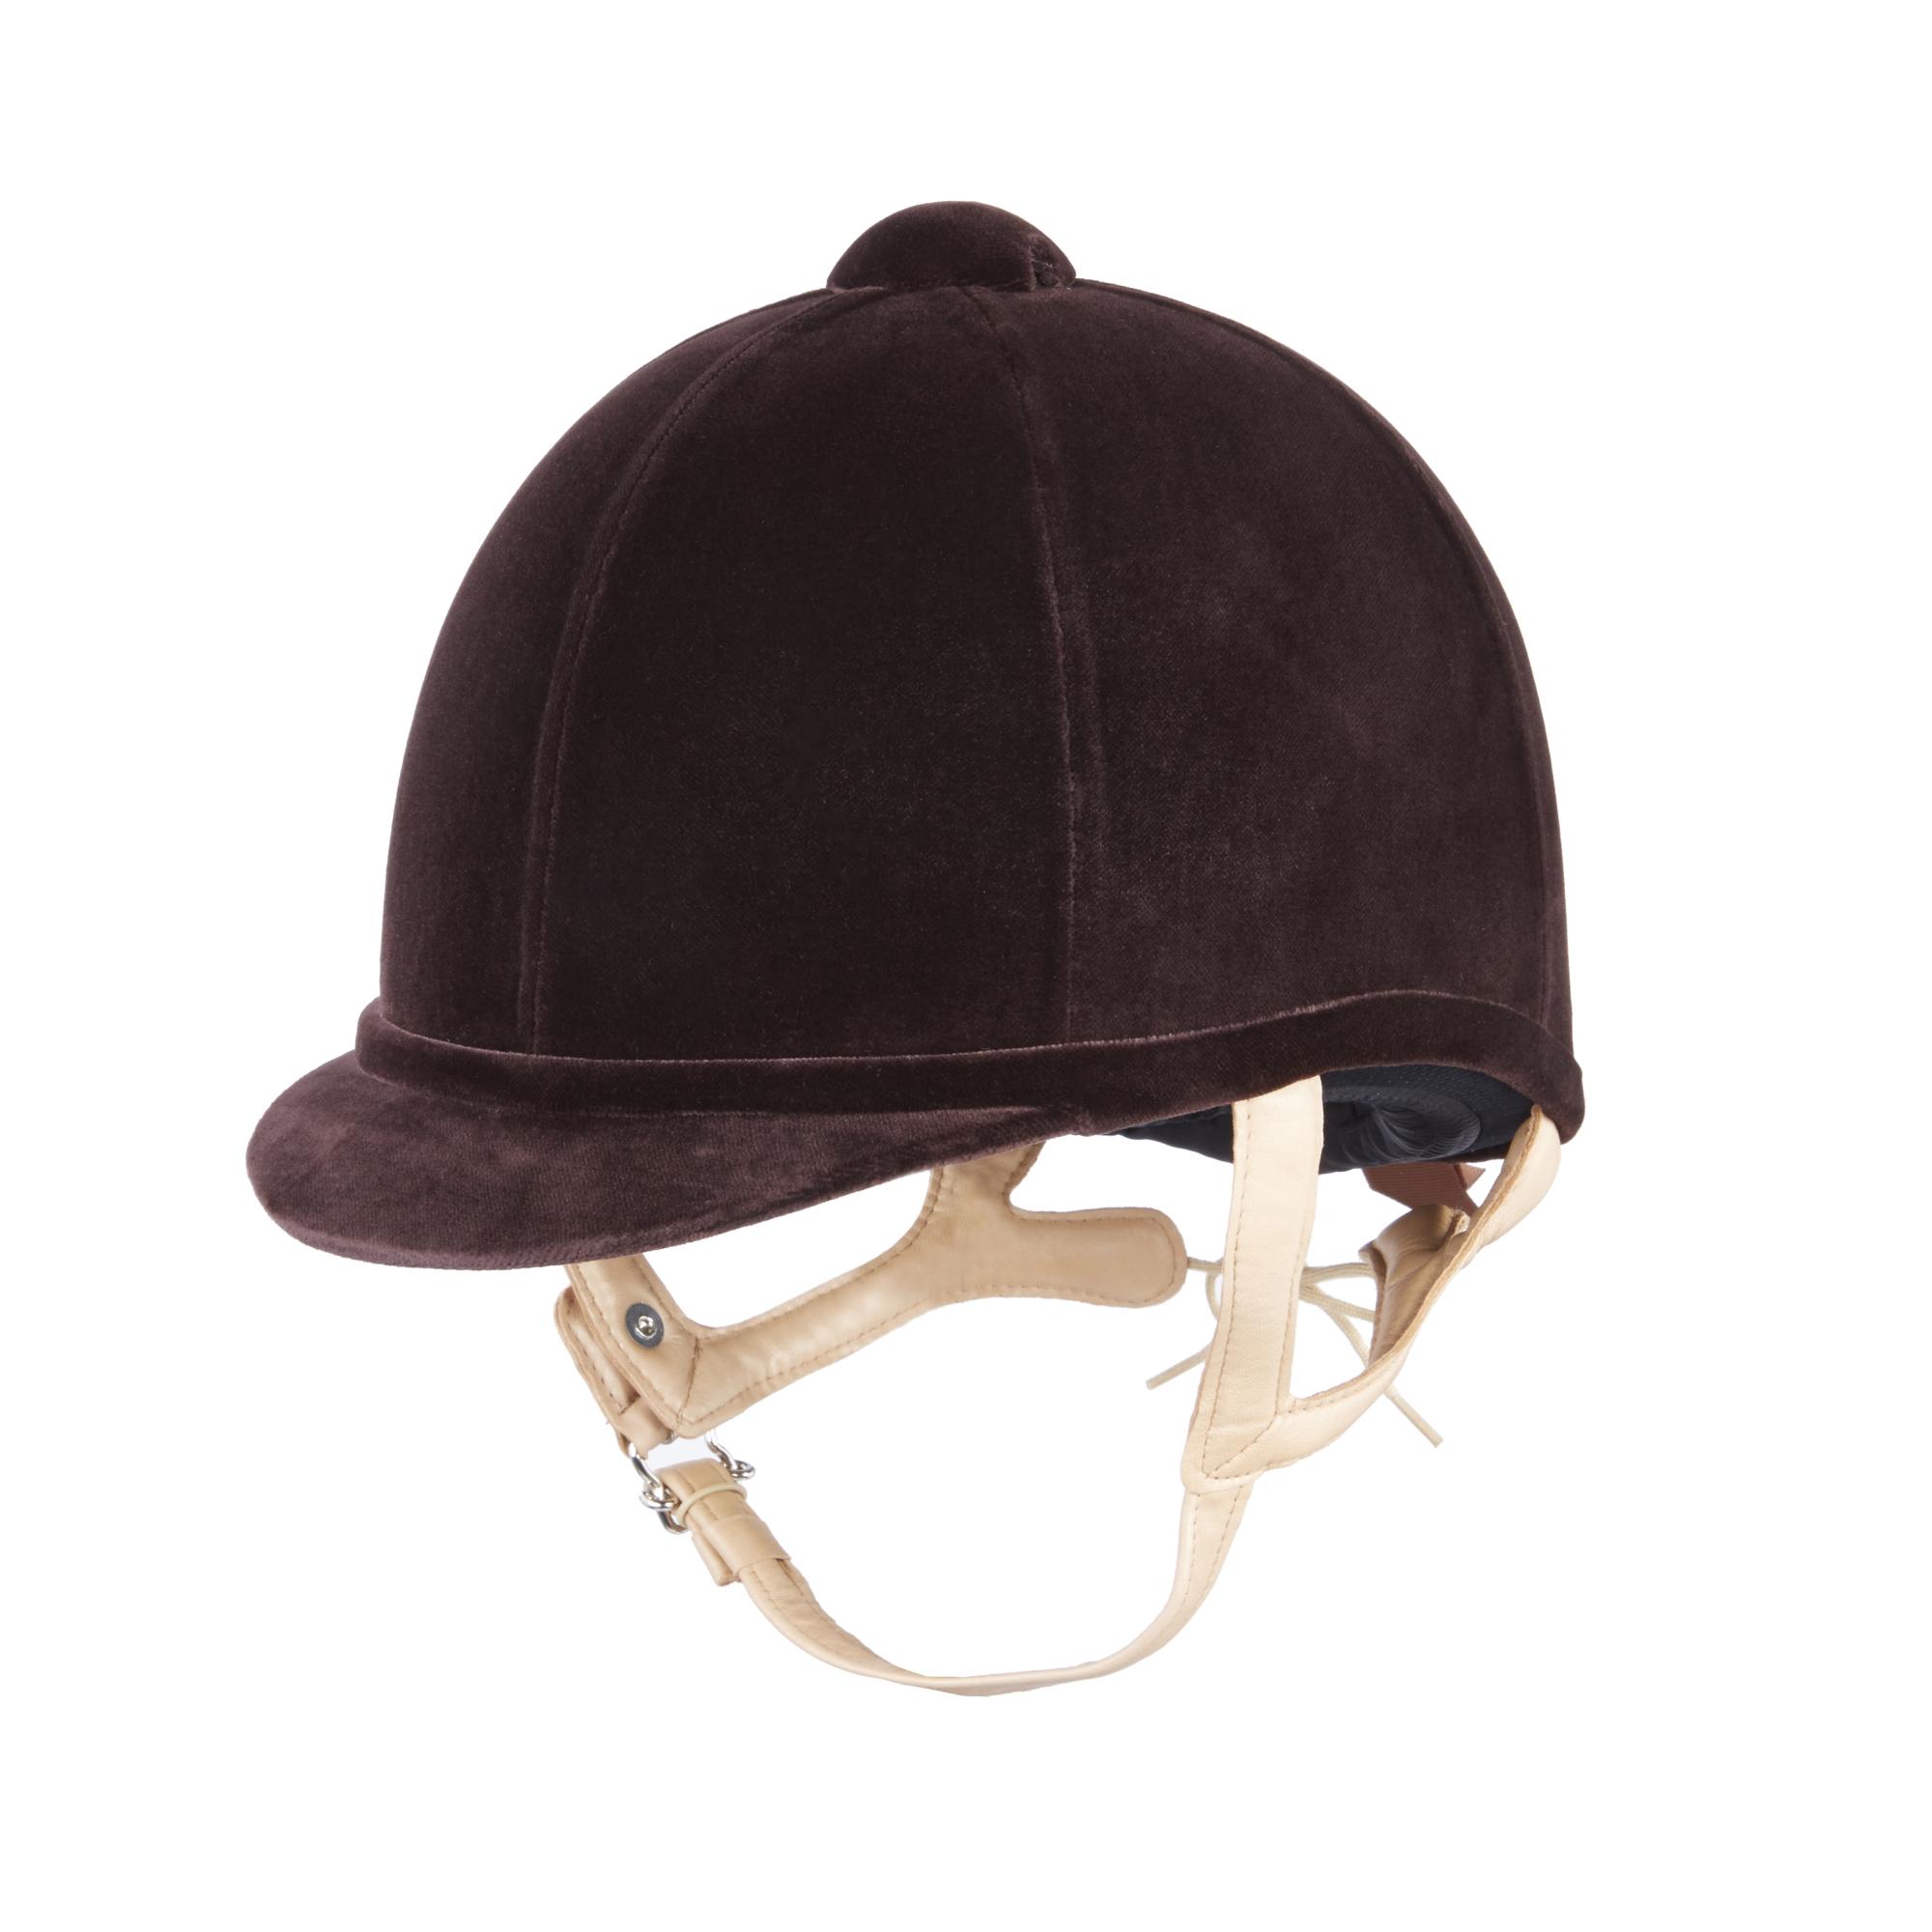 Charles Owen Fian Riding Hat - Braun With Flesh Harness Harness Flesh b39e42